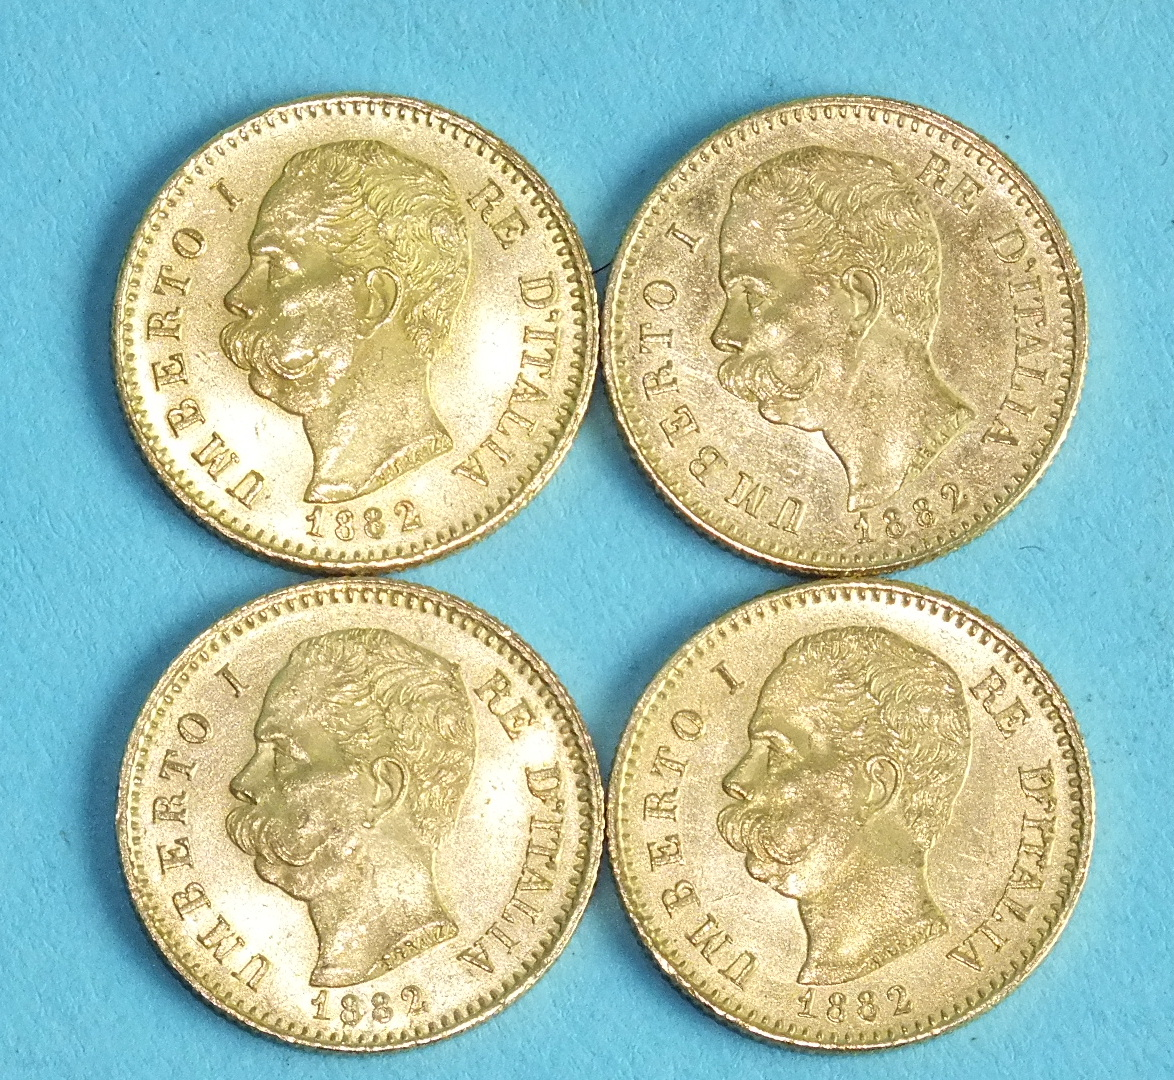 Lot 388 - Four Italian Kingdom Umberto I 20-Lire coins, 1882, (4).